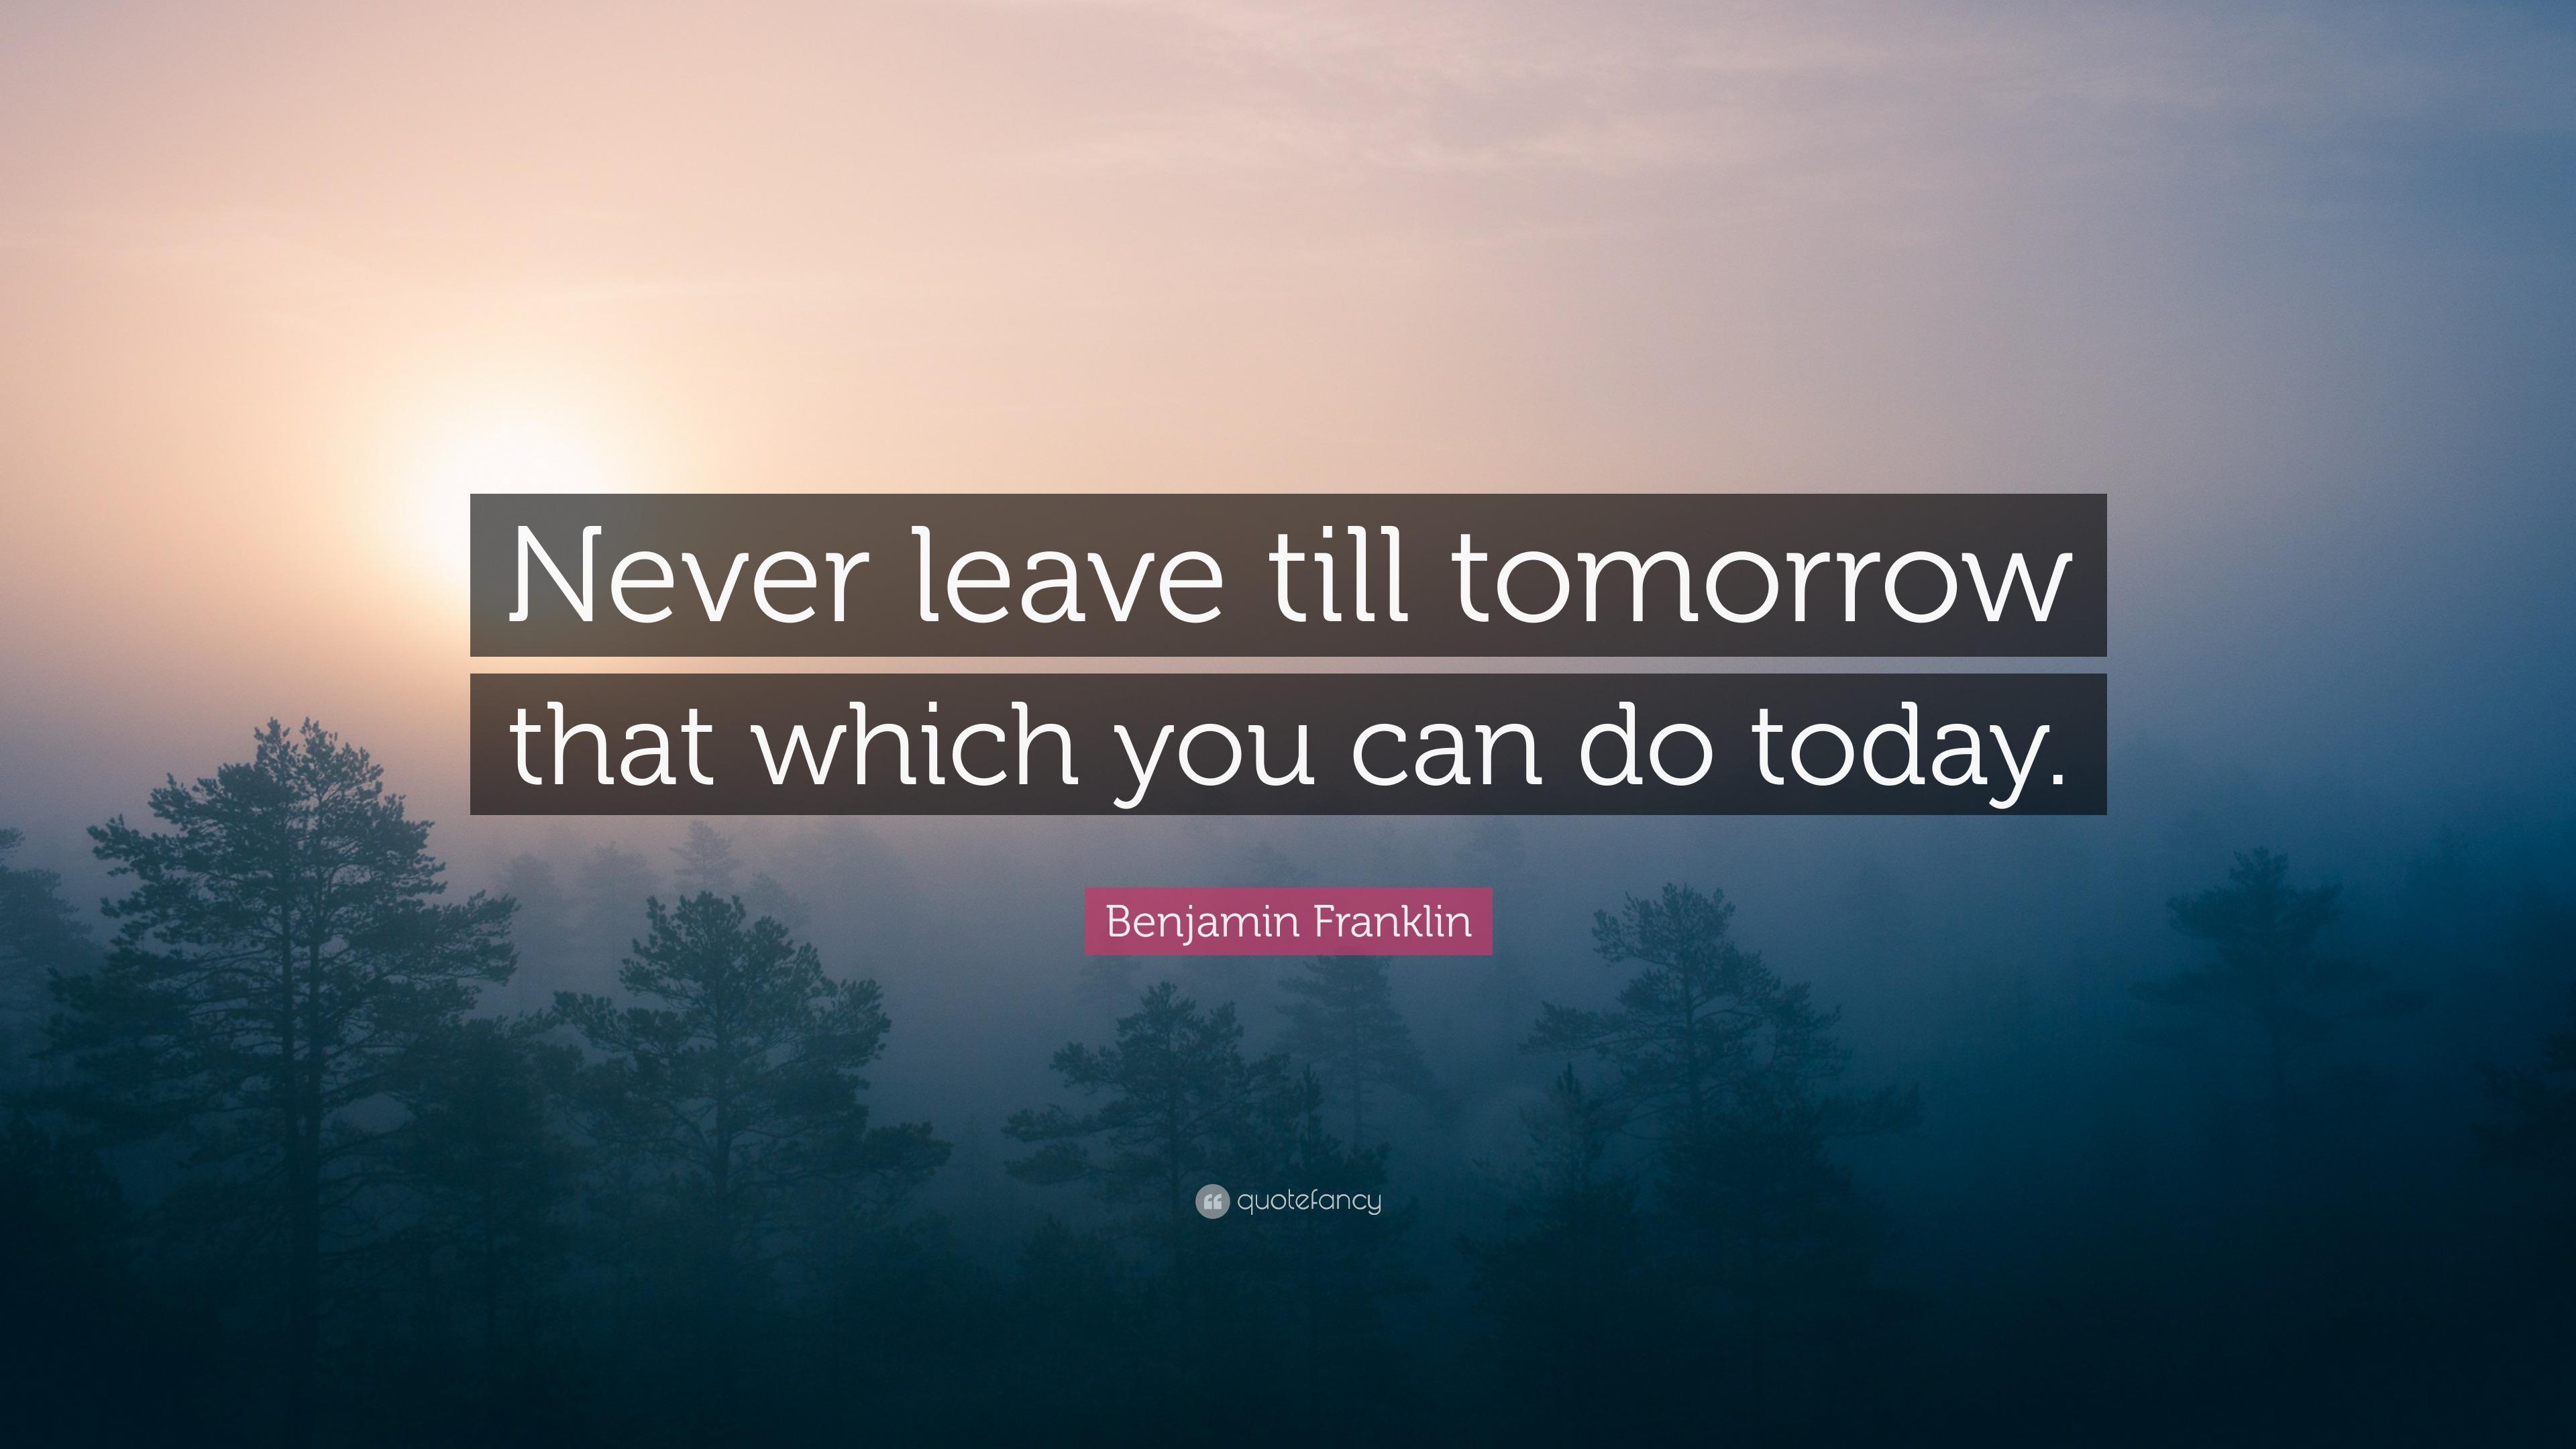 Benjamin Franklin Quotes Wallpaper Benjamin Franklin Quote Never Leave Till Tomorrow That